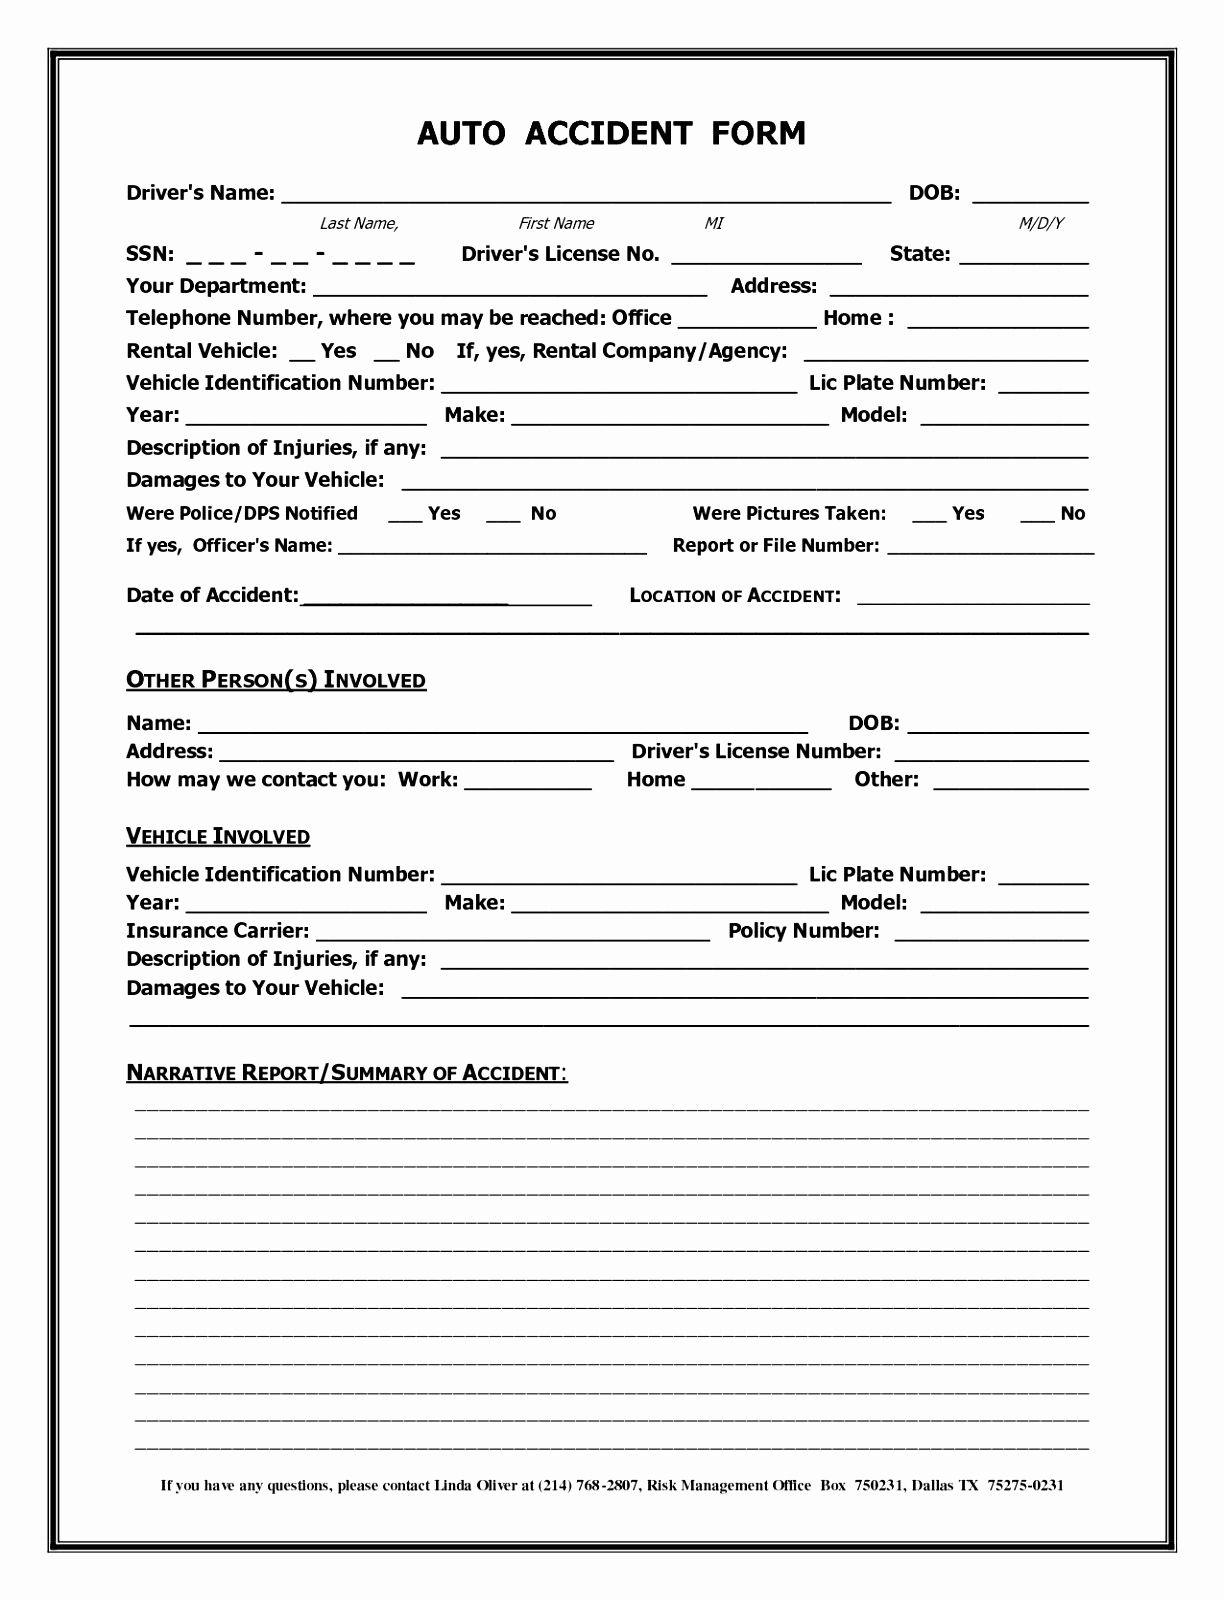 008 Auto Accident Report Form California Automobile Template For